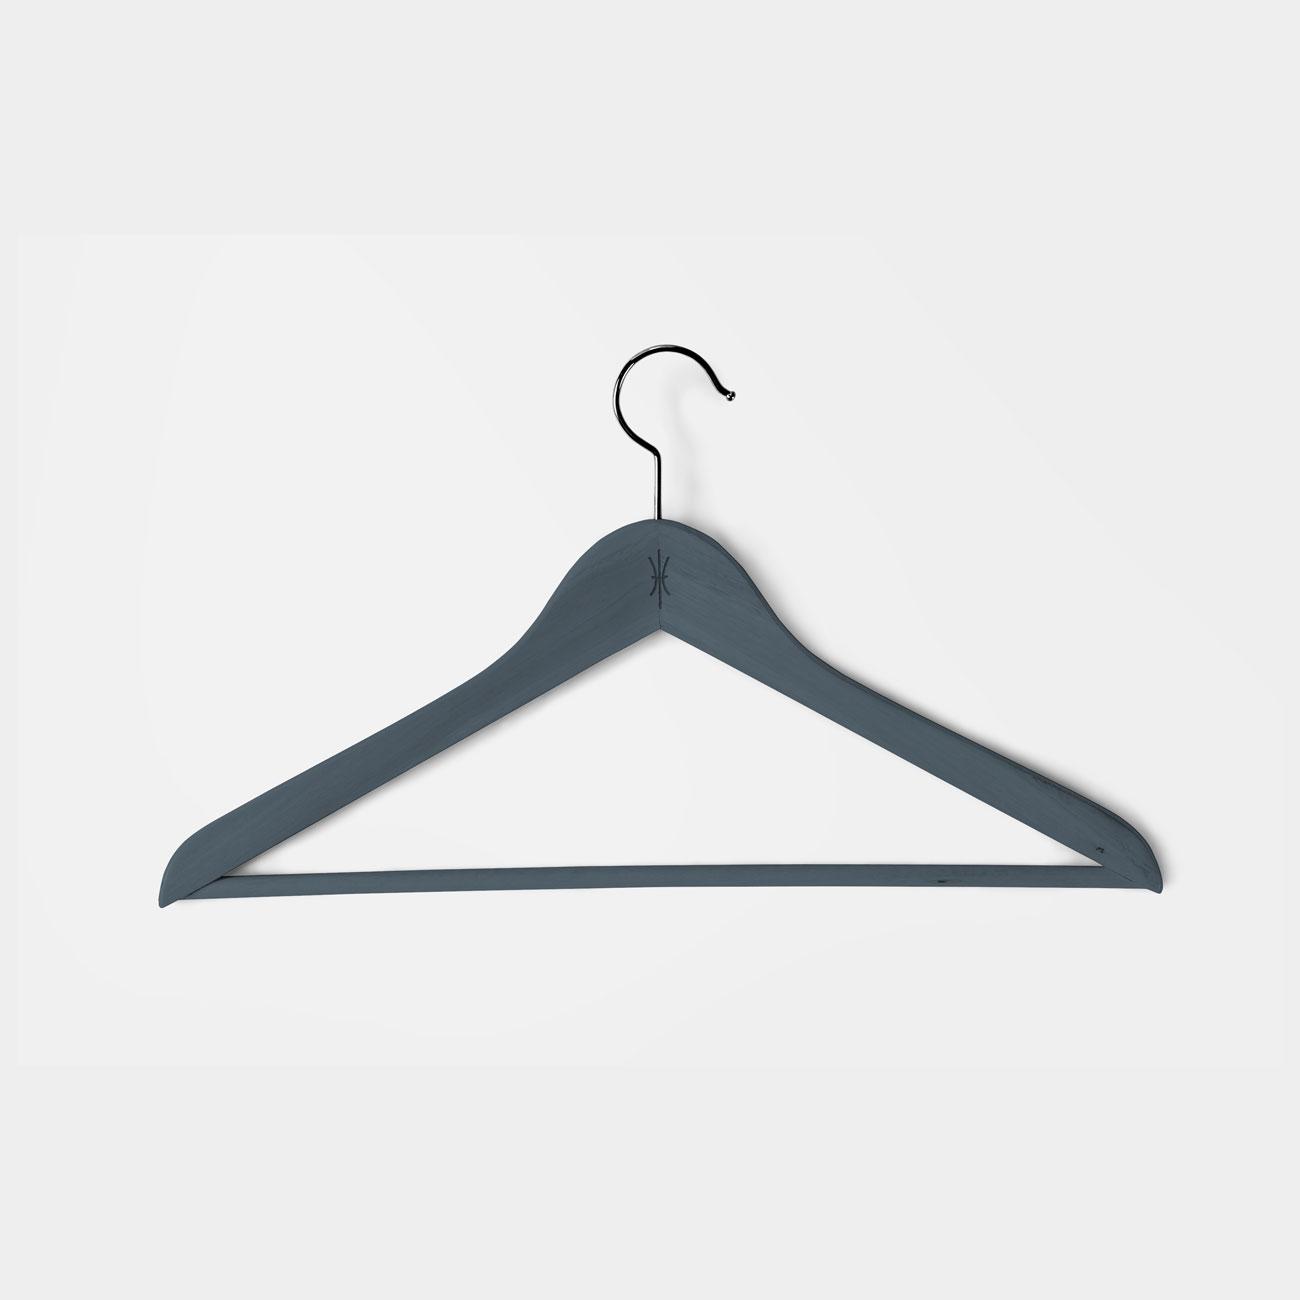 Coat hanger with icon